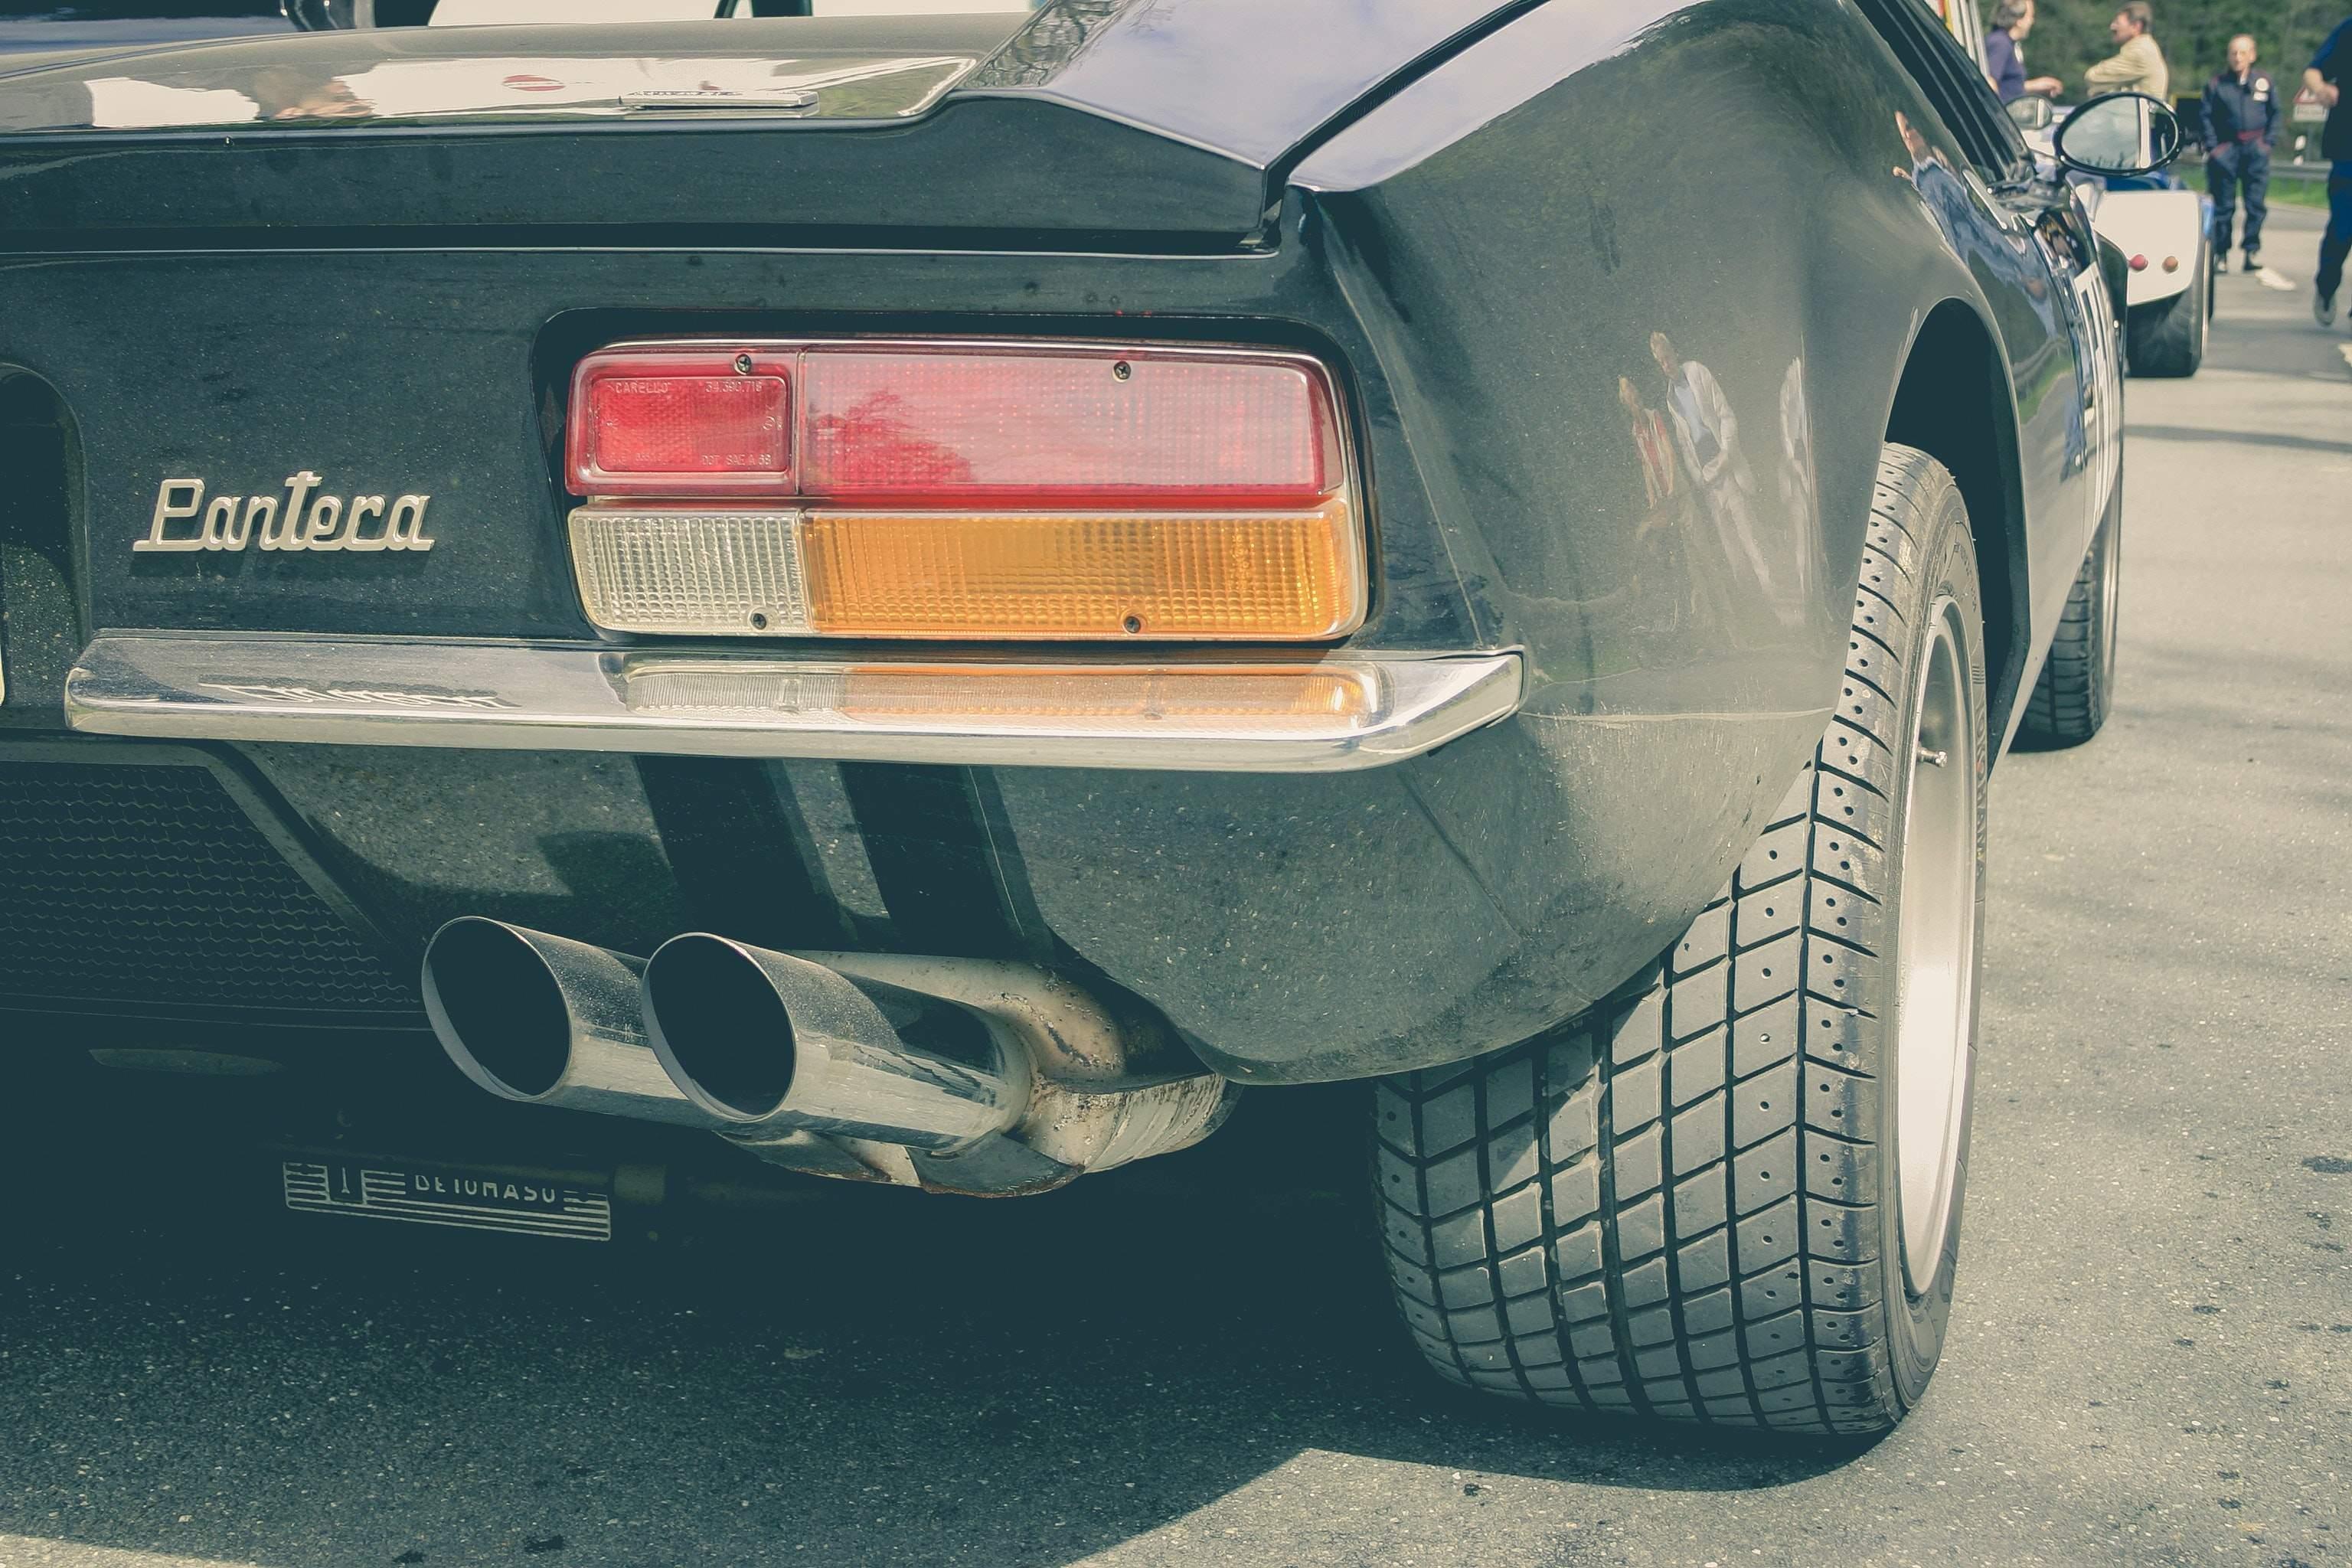 Car exhaust, diesel, petrol, emissions